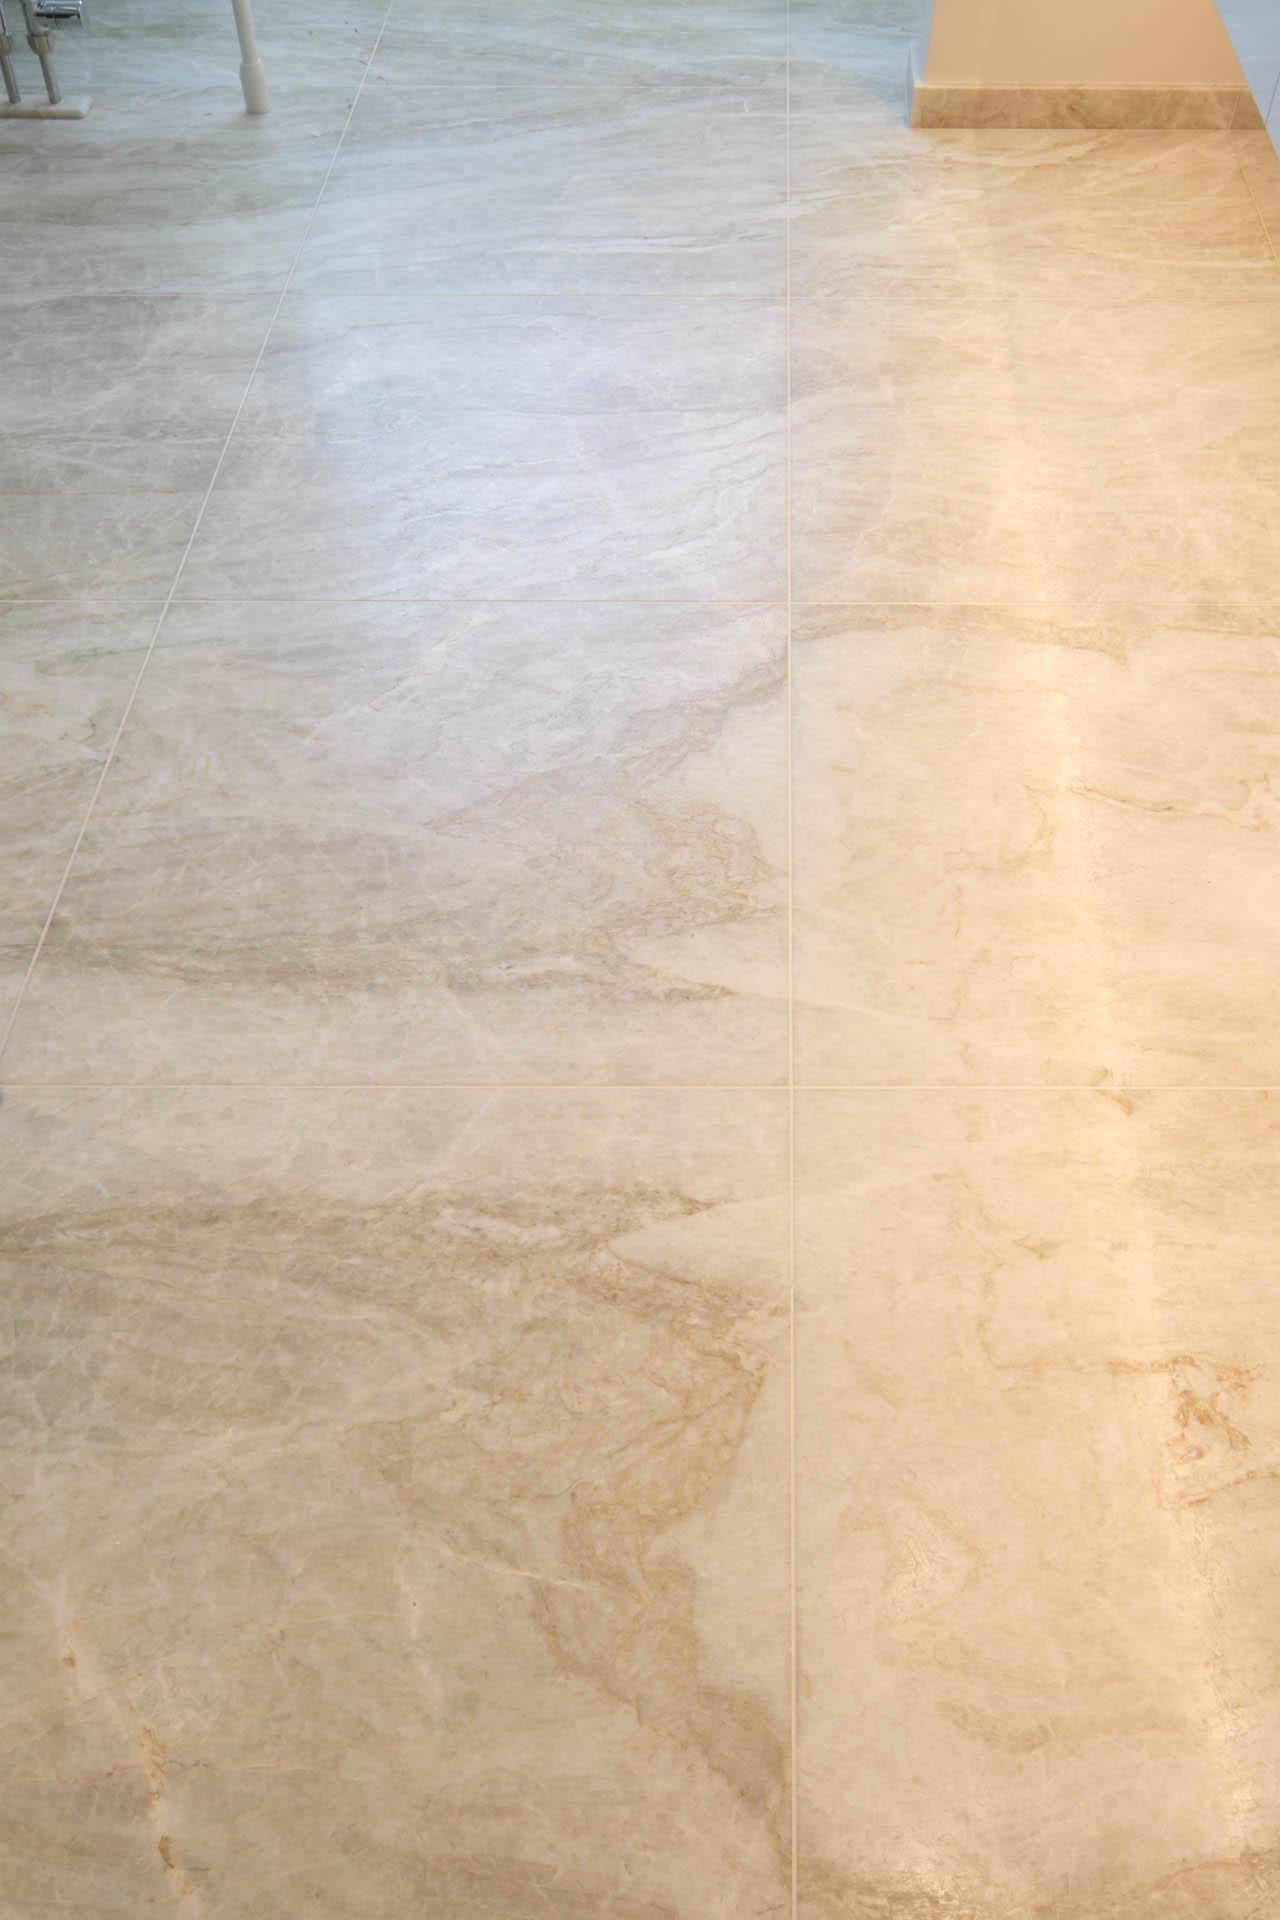 Heller Quarzit als Bodenbelag im Badezimmer